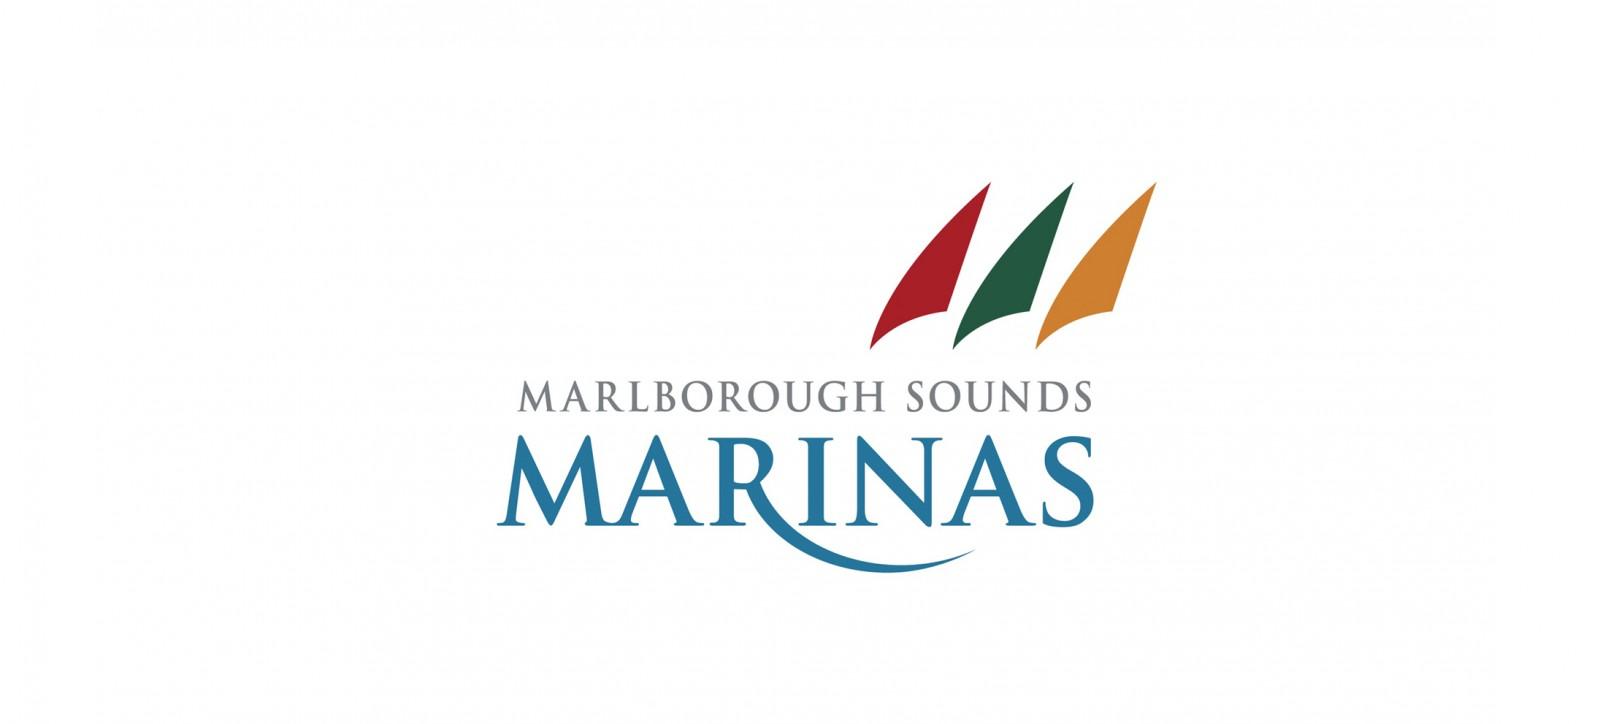 MarlboroughMarinas